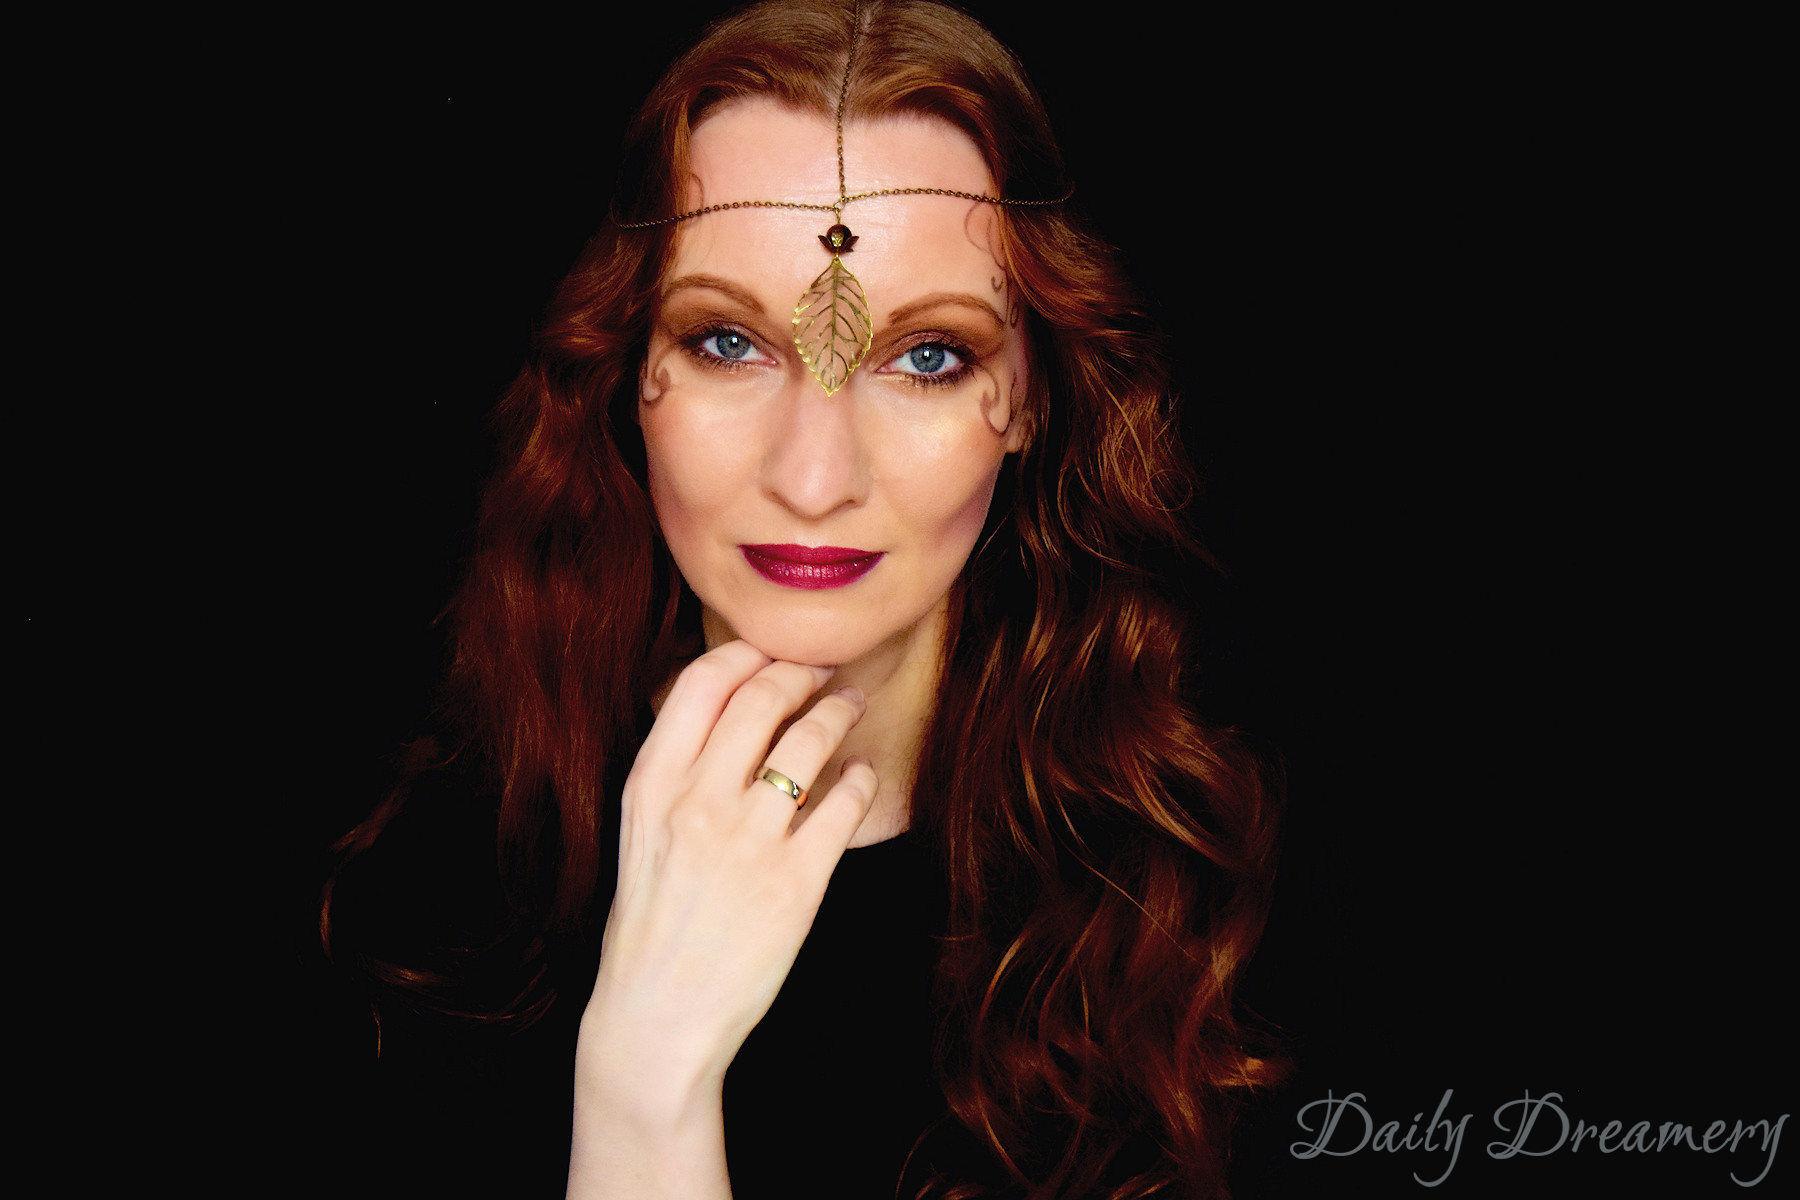 Autumn-Fairy – ein zauberhafter Halloween-Look mit zarter Feen-Krone | Daily Dreamery